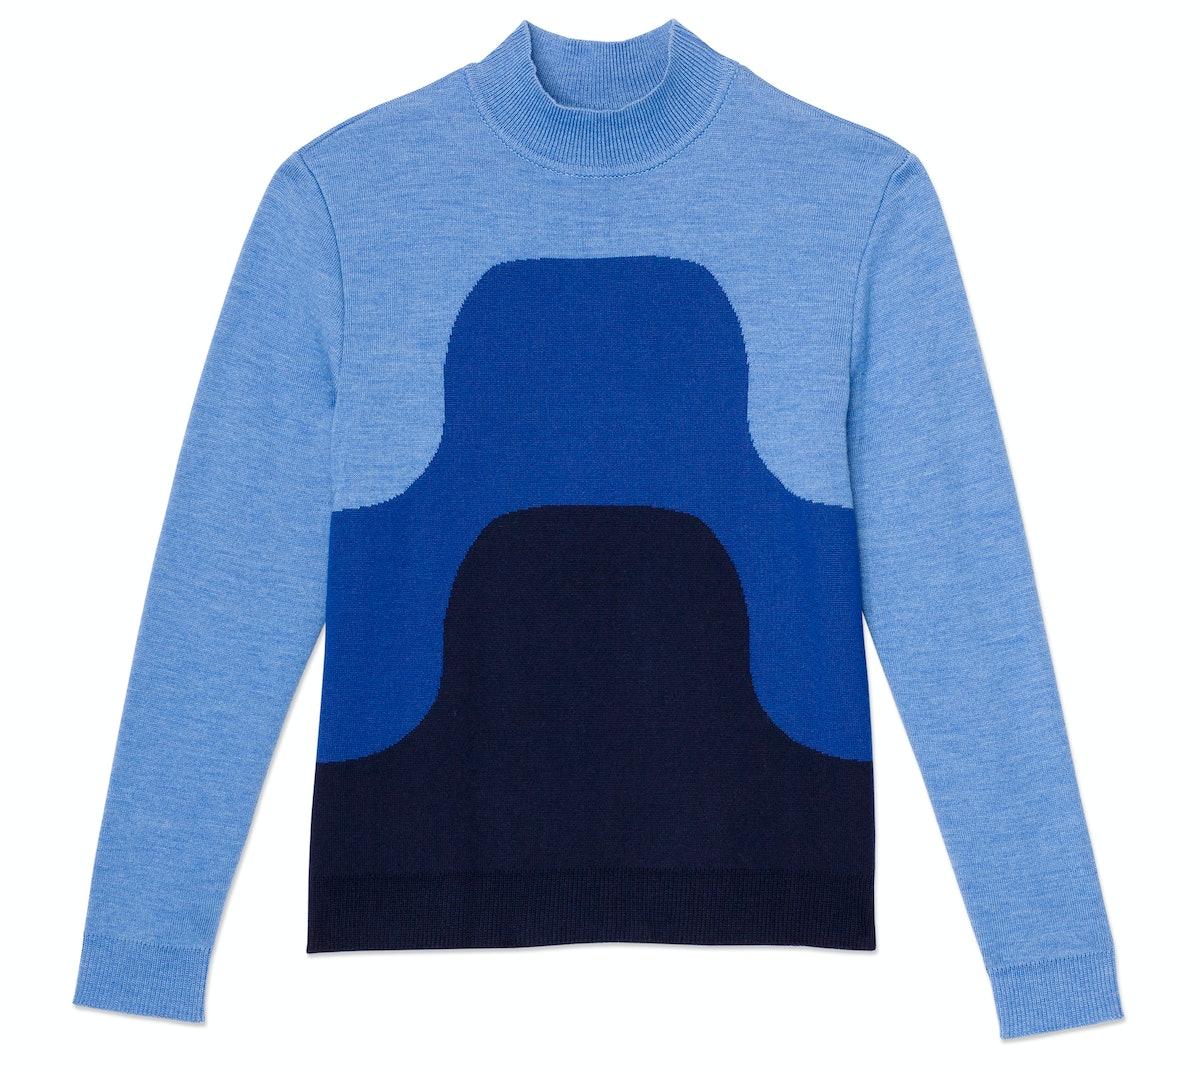 Trademark sweater